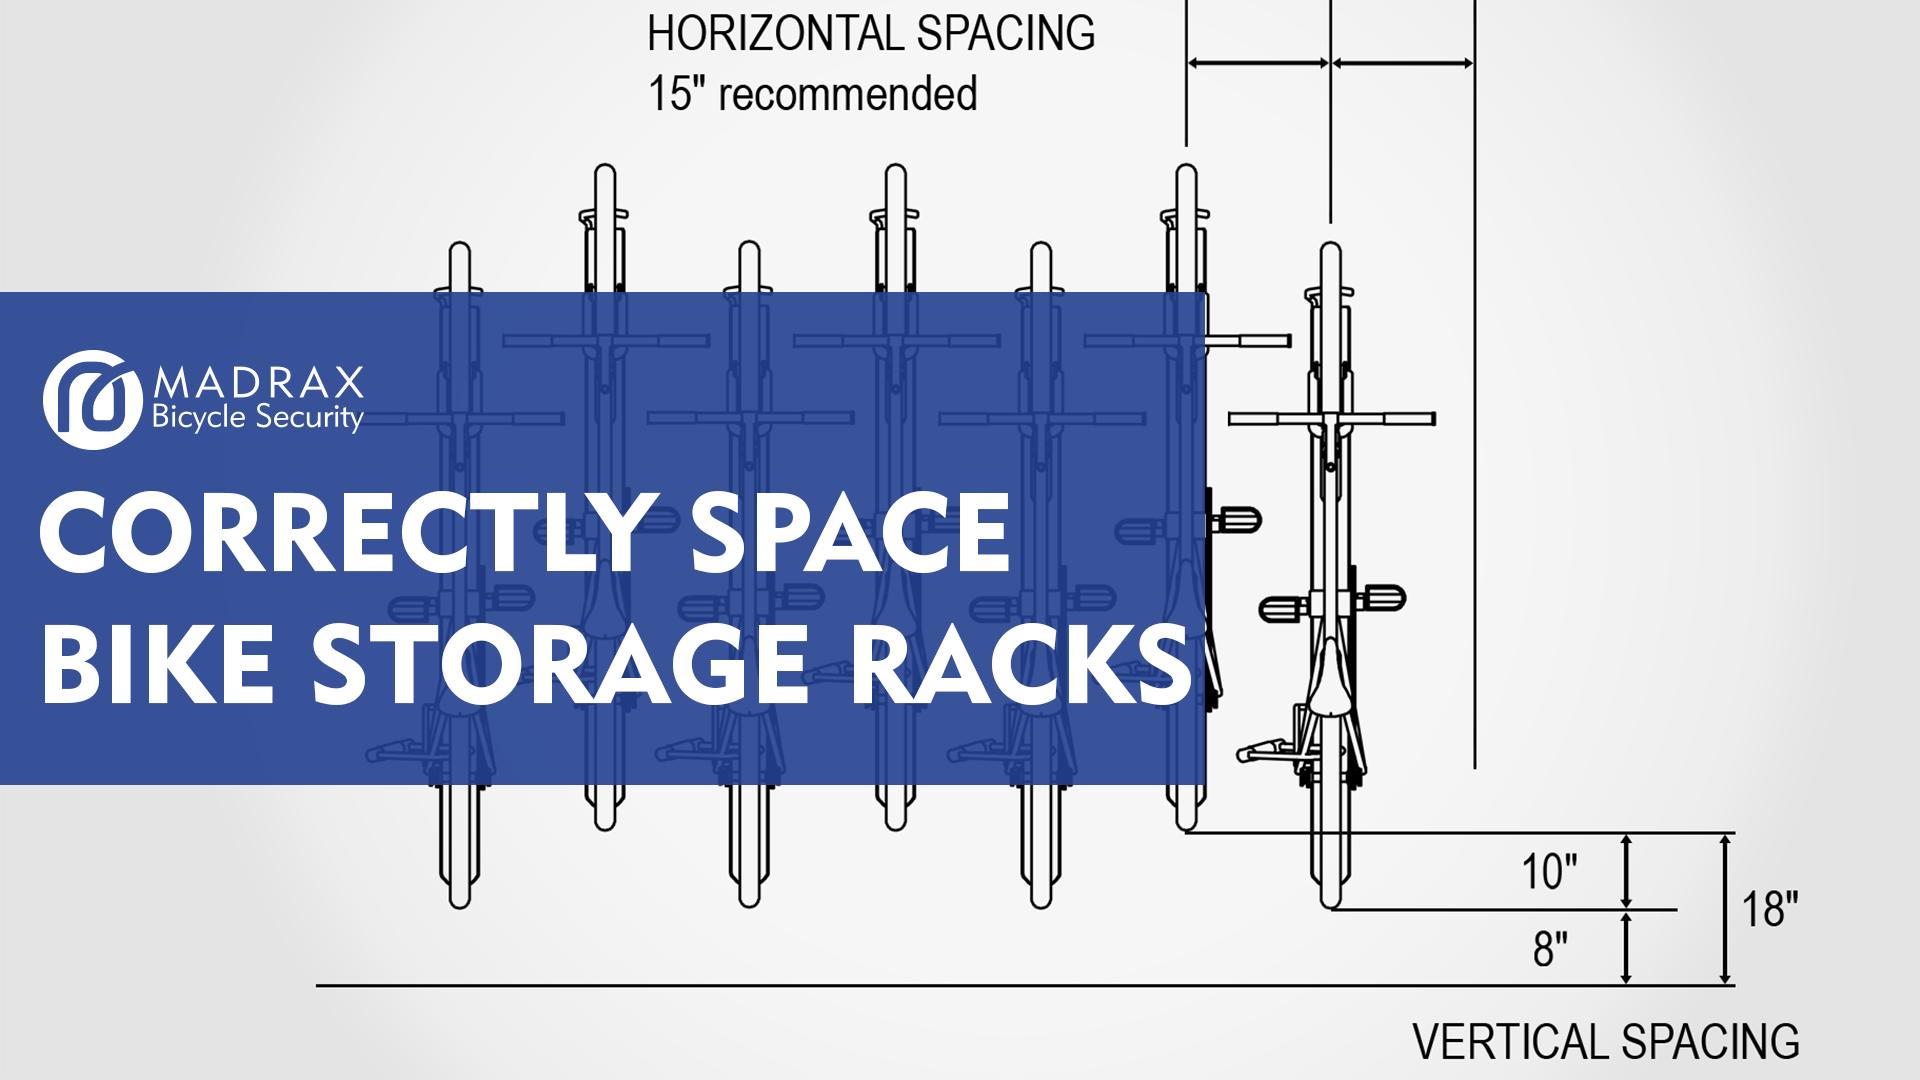 Correctly Space Bike Storage Racks Title